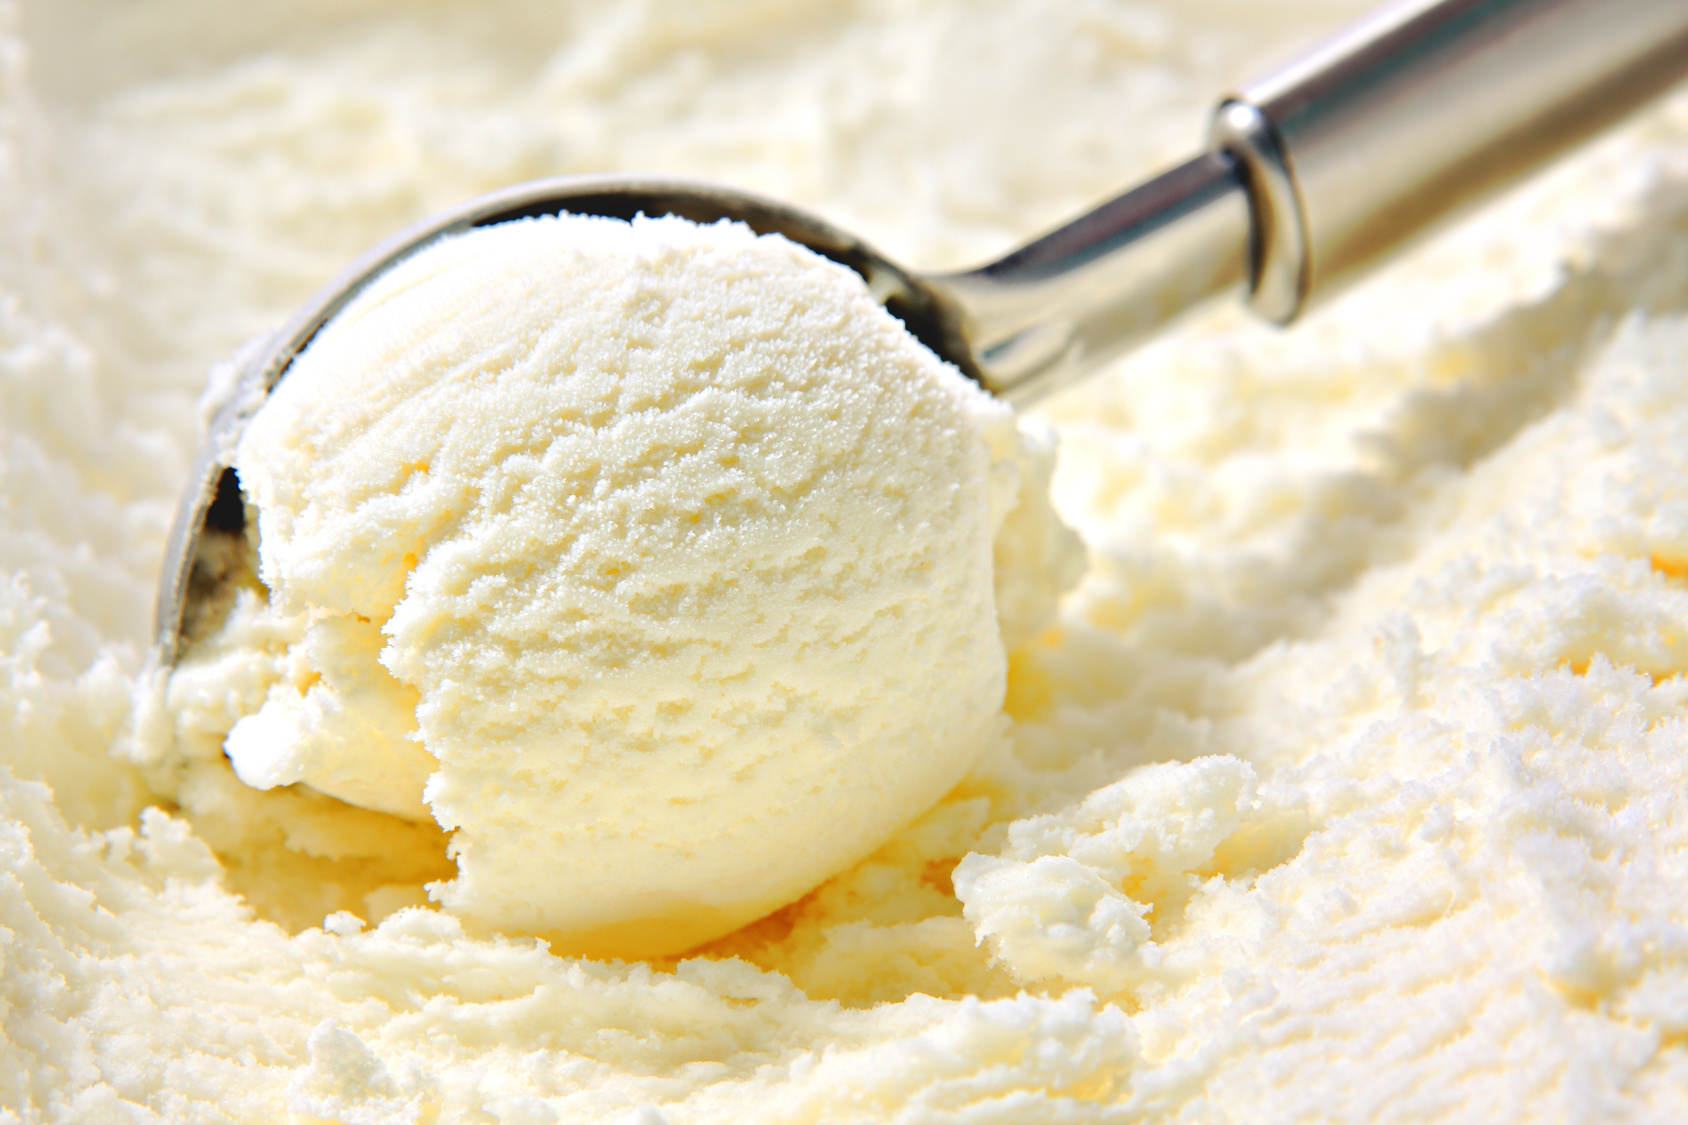 Profitable Ice Cream Shop In DFW for Sale